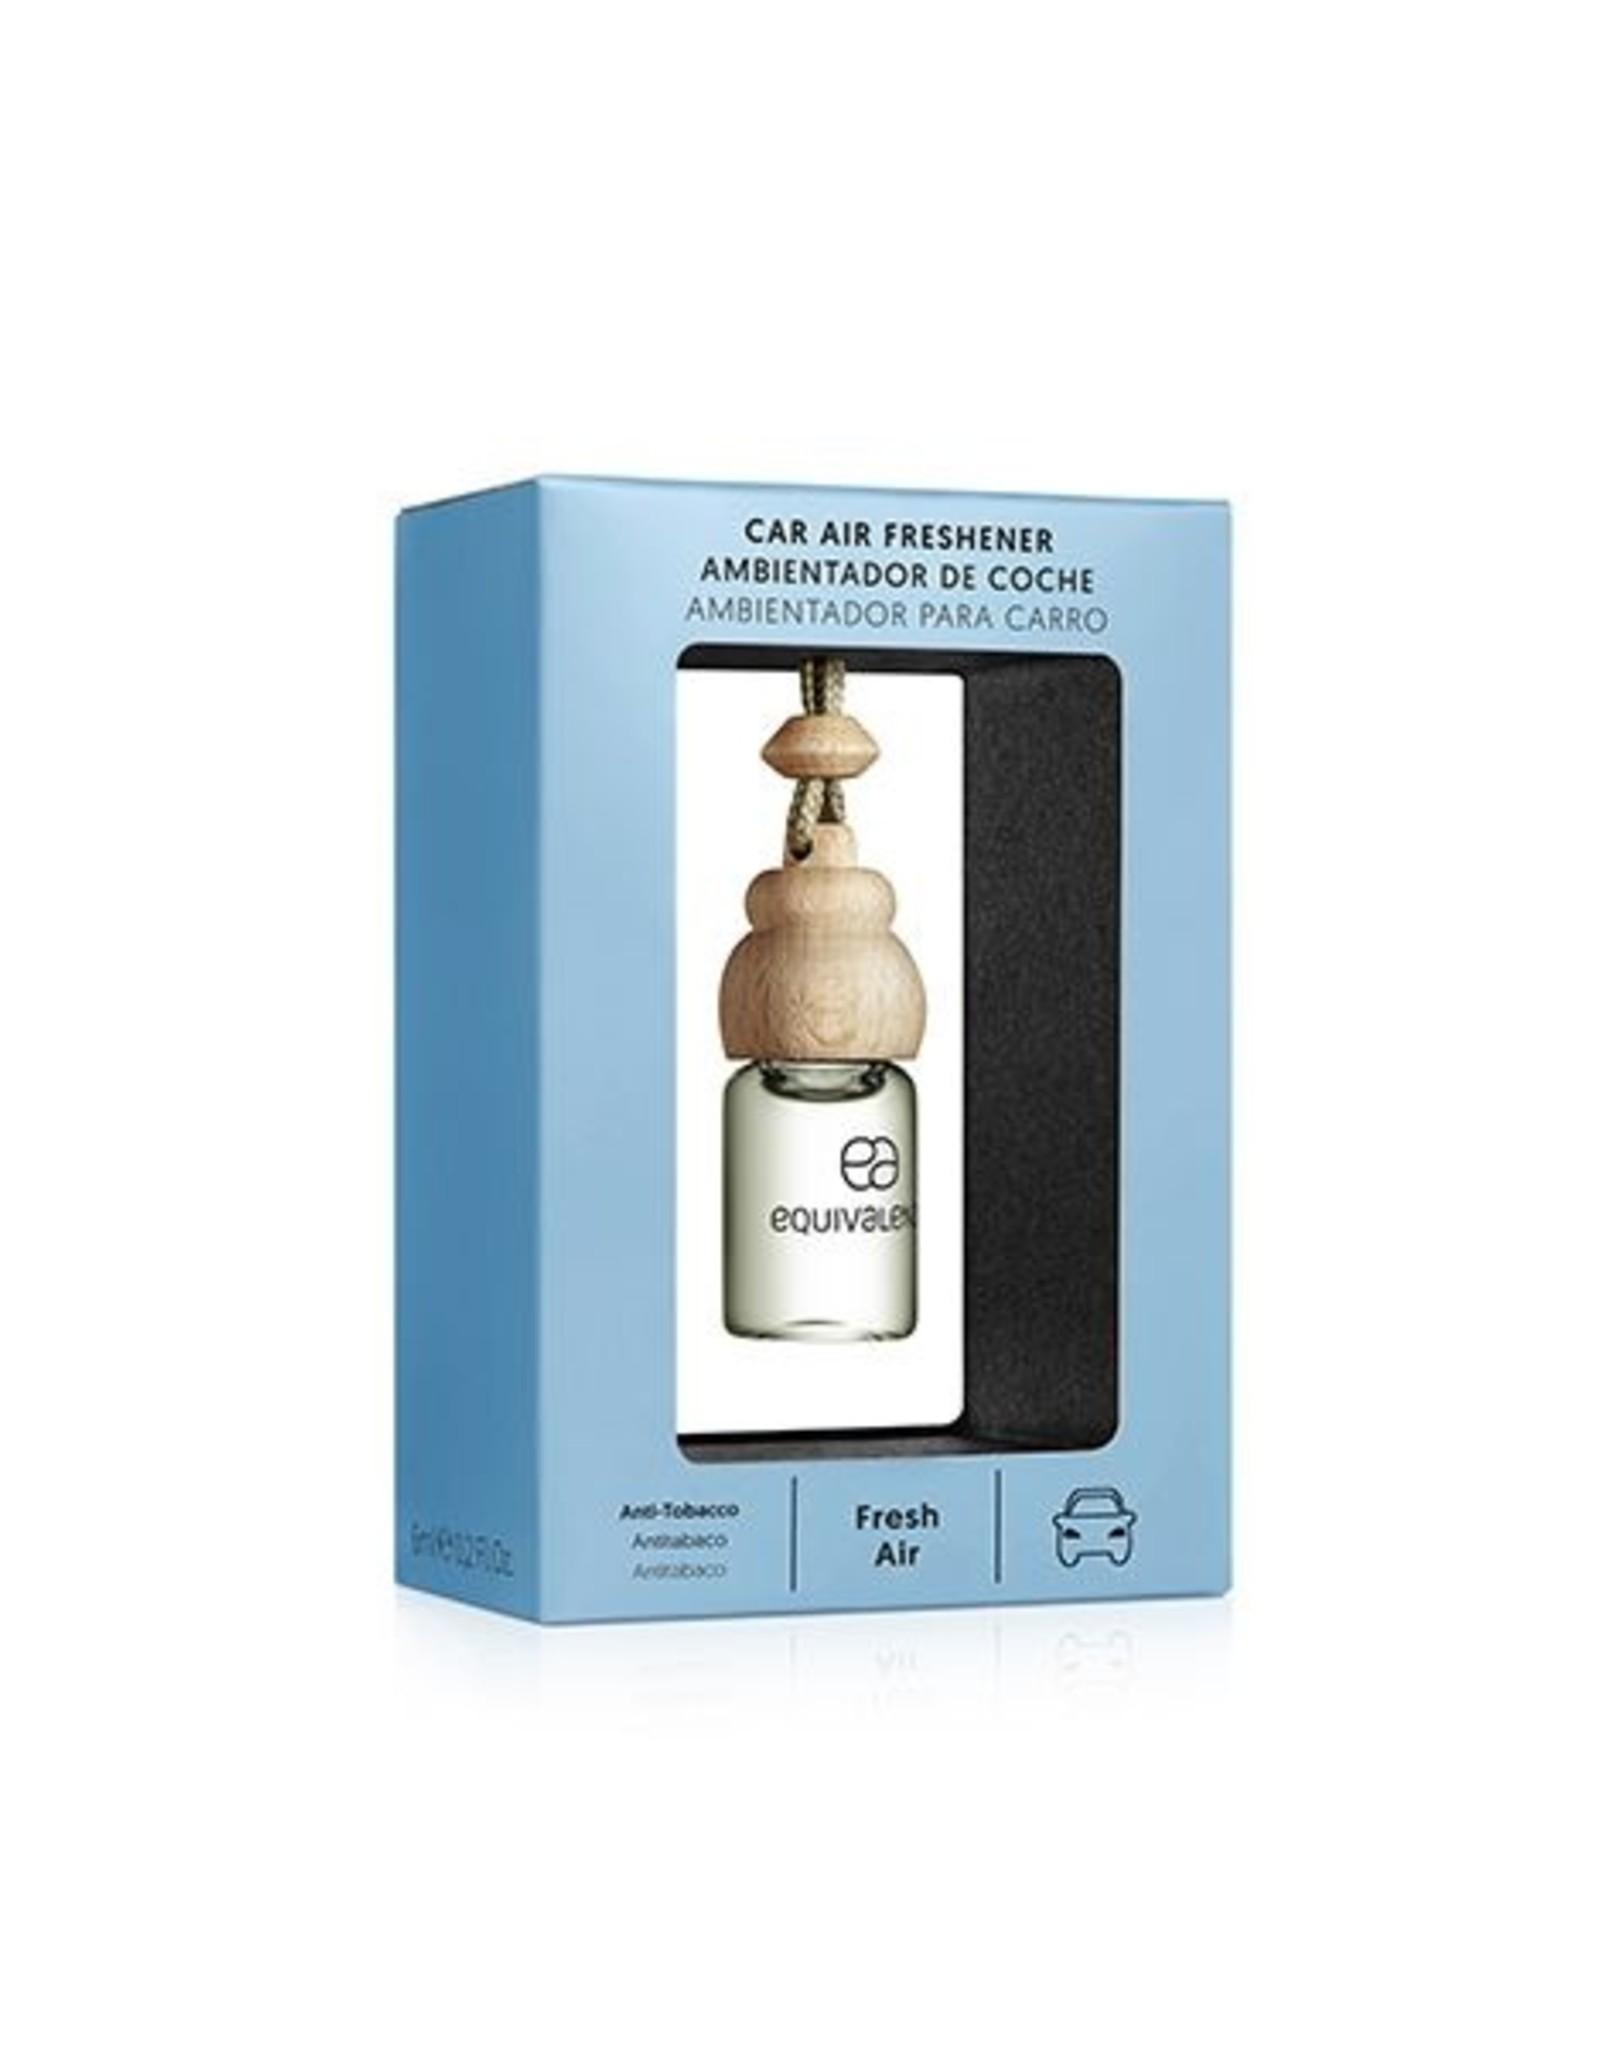 Equivalenza Car Air Freshener - Air Fresh  (anti-tobacco and odour neutralizer)